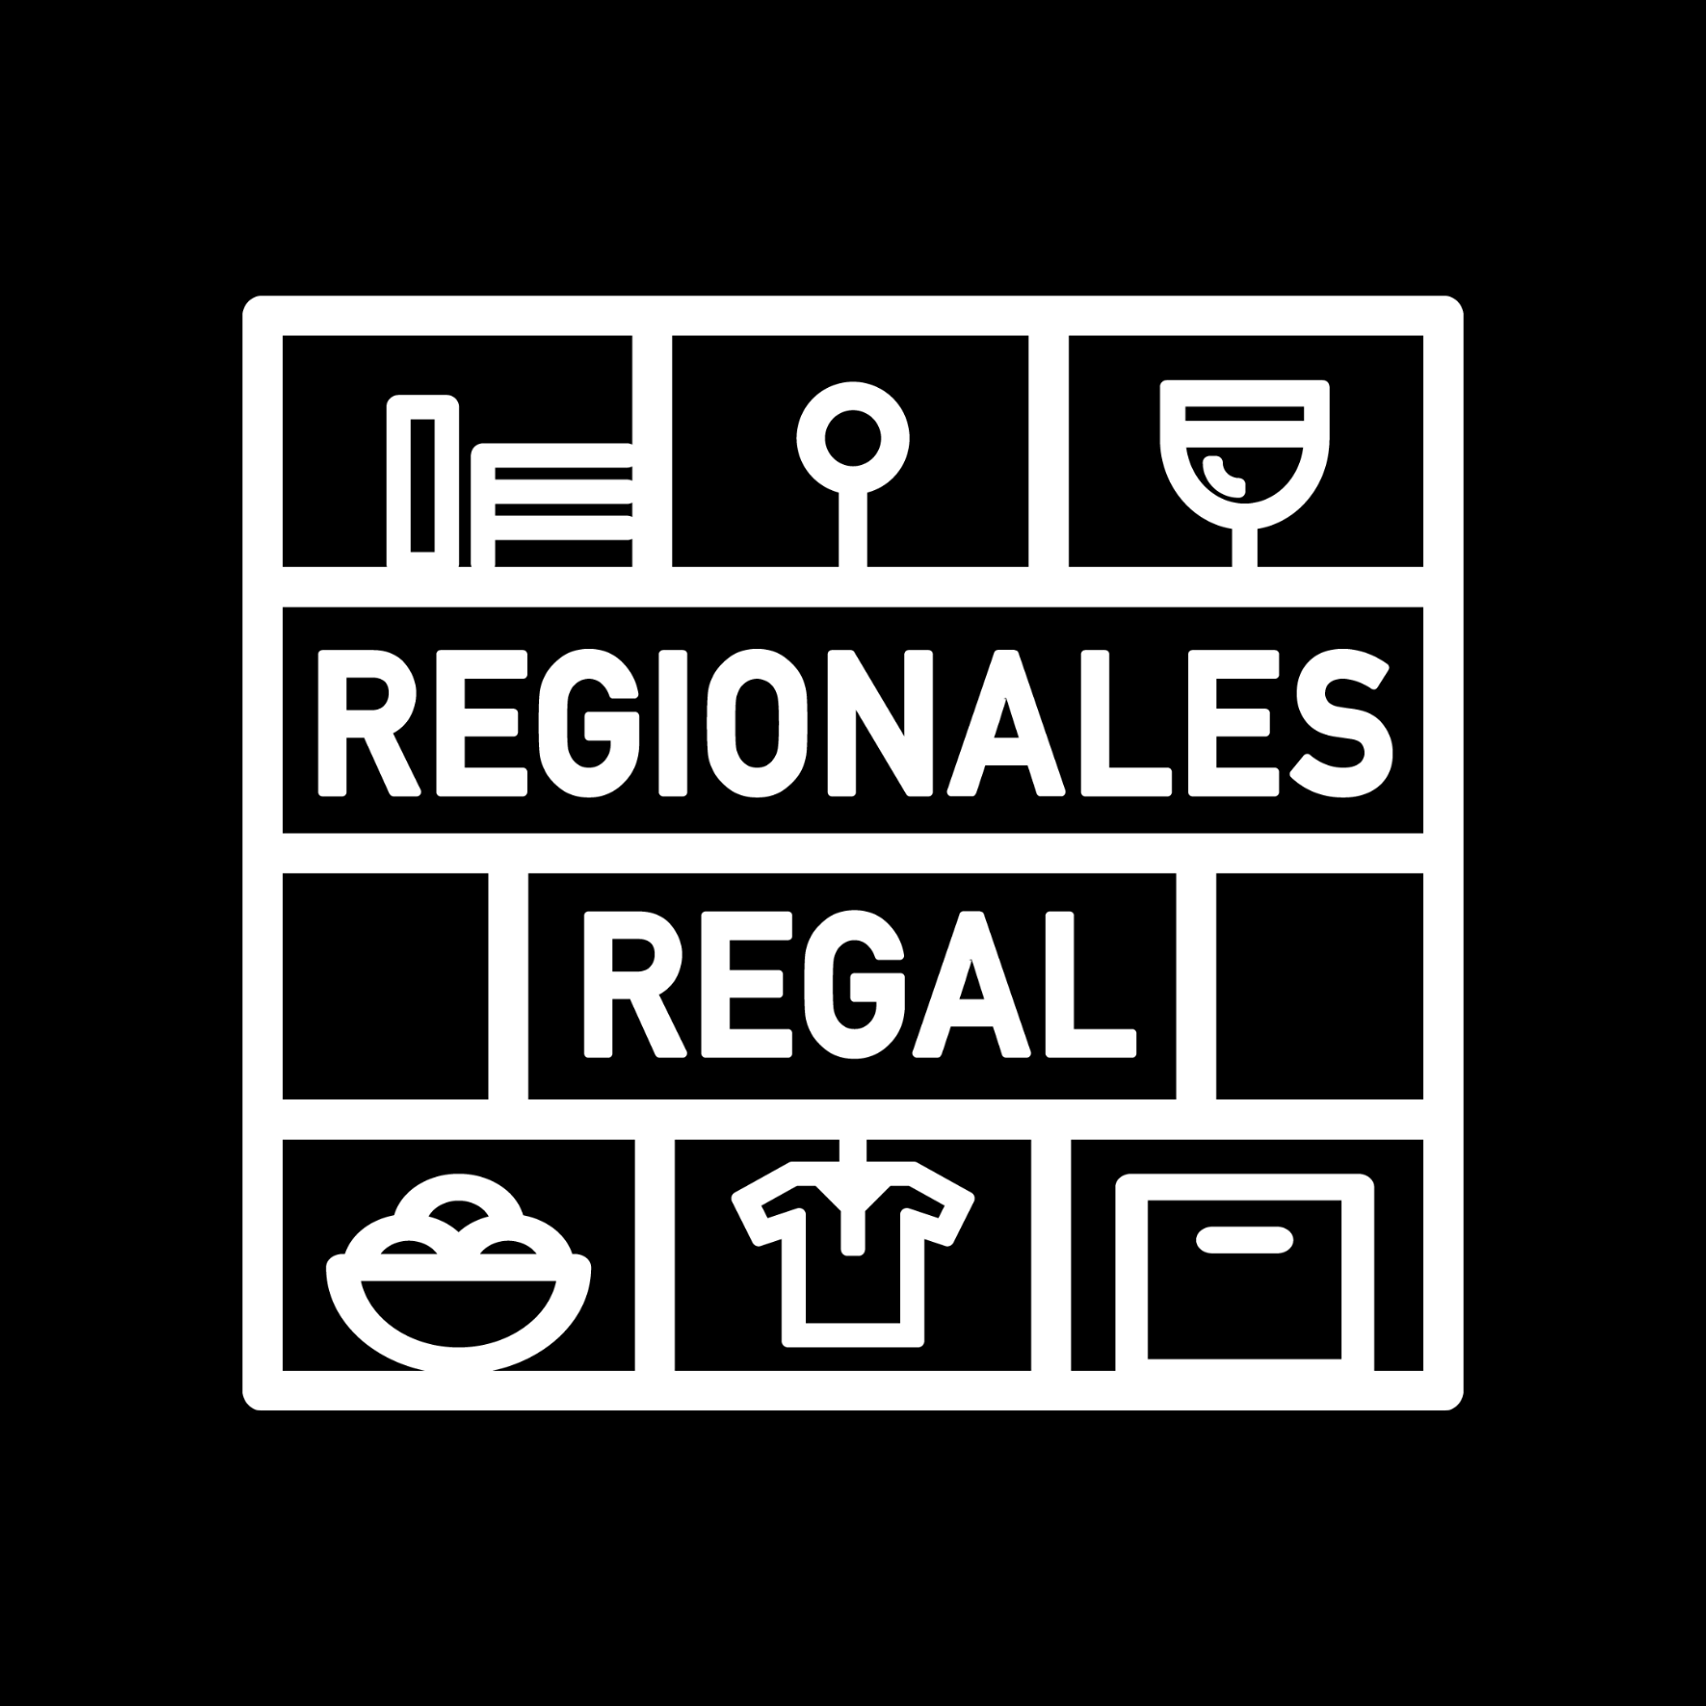 Regionales Regal